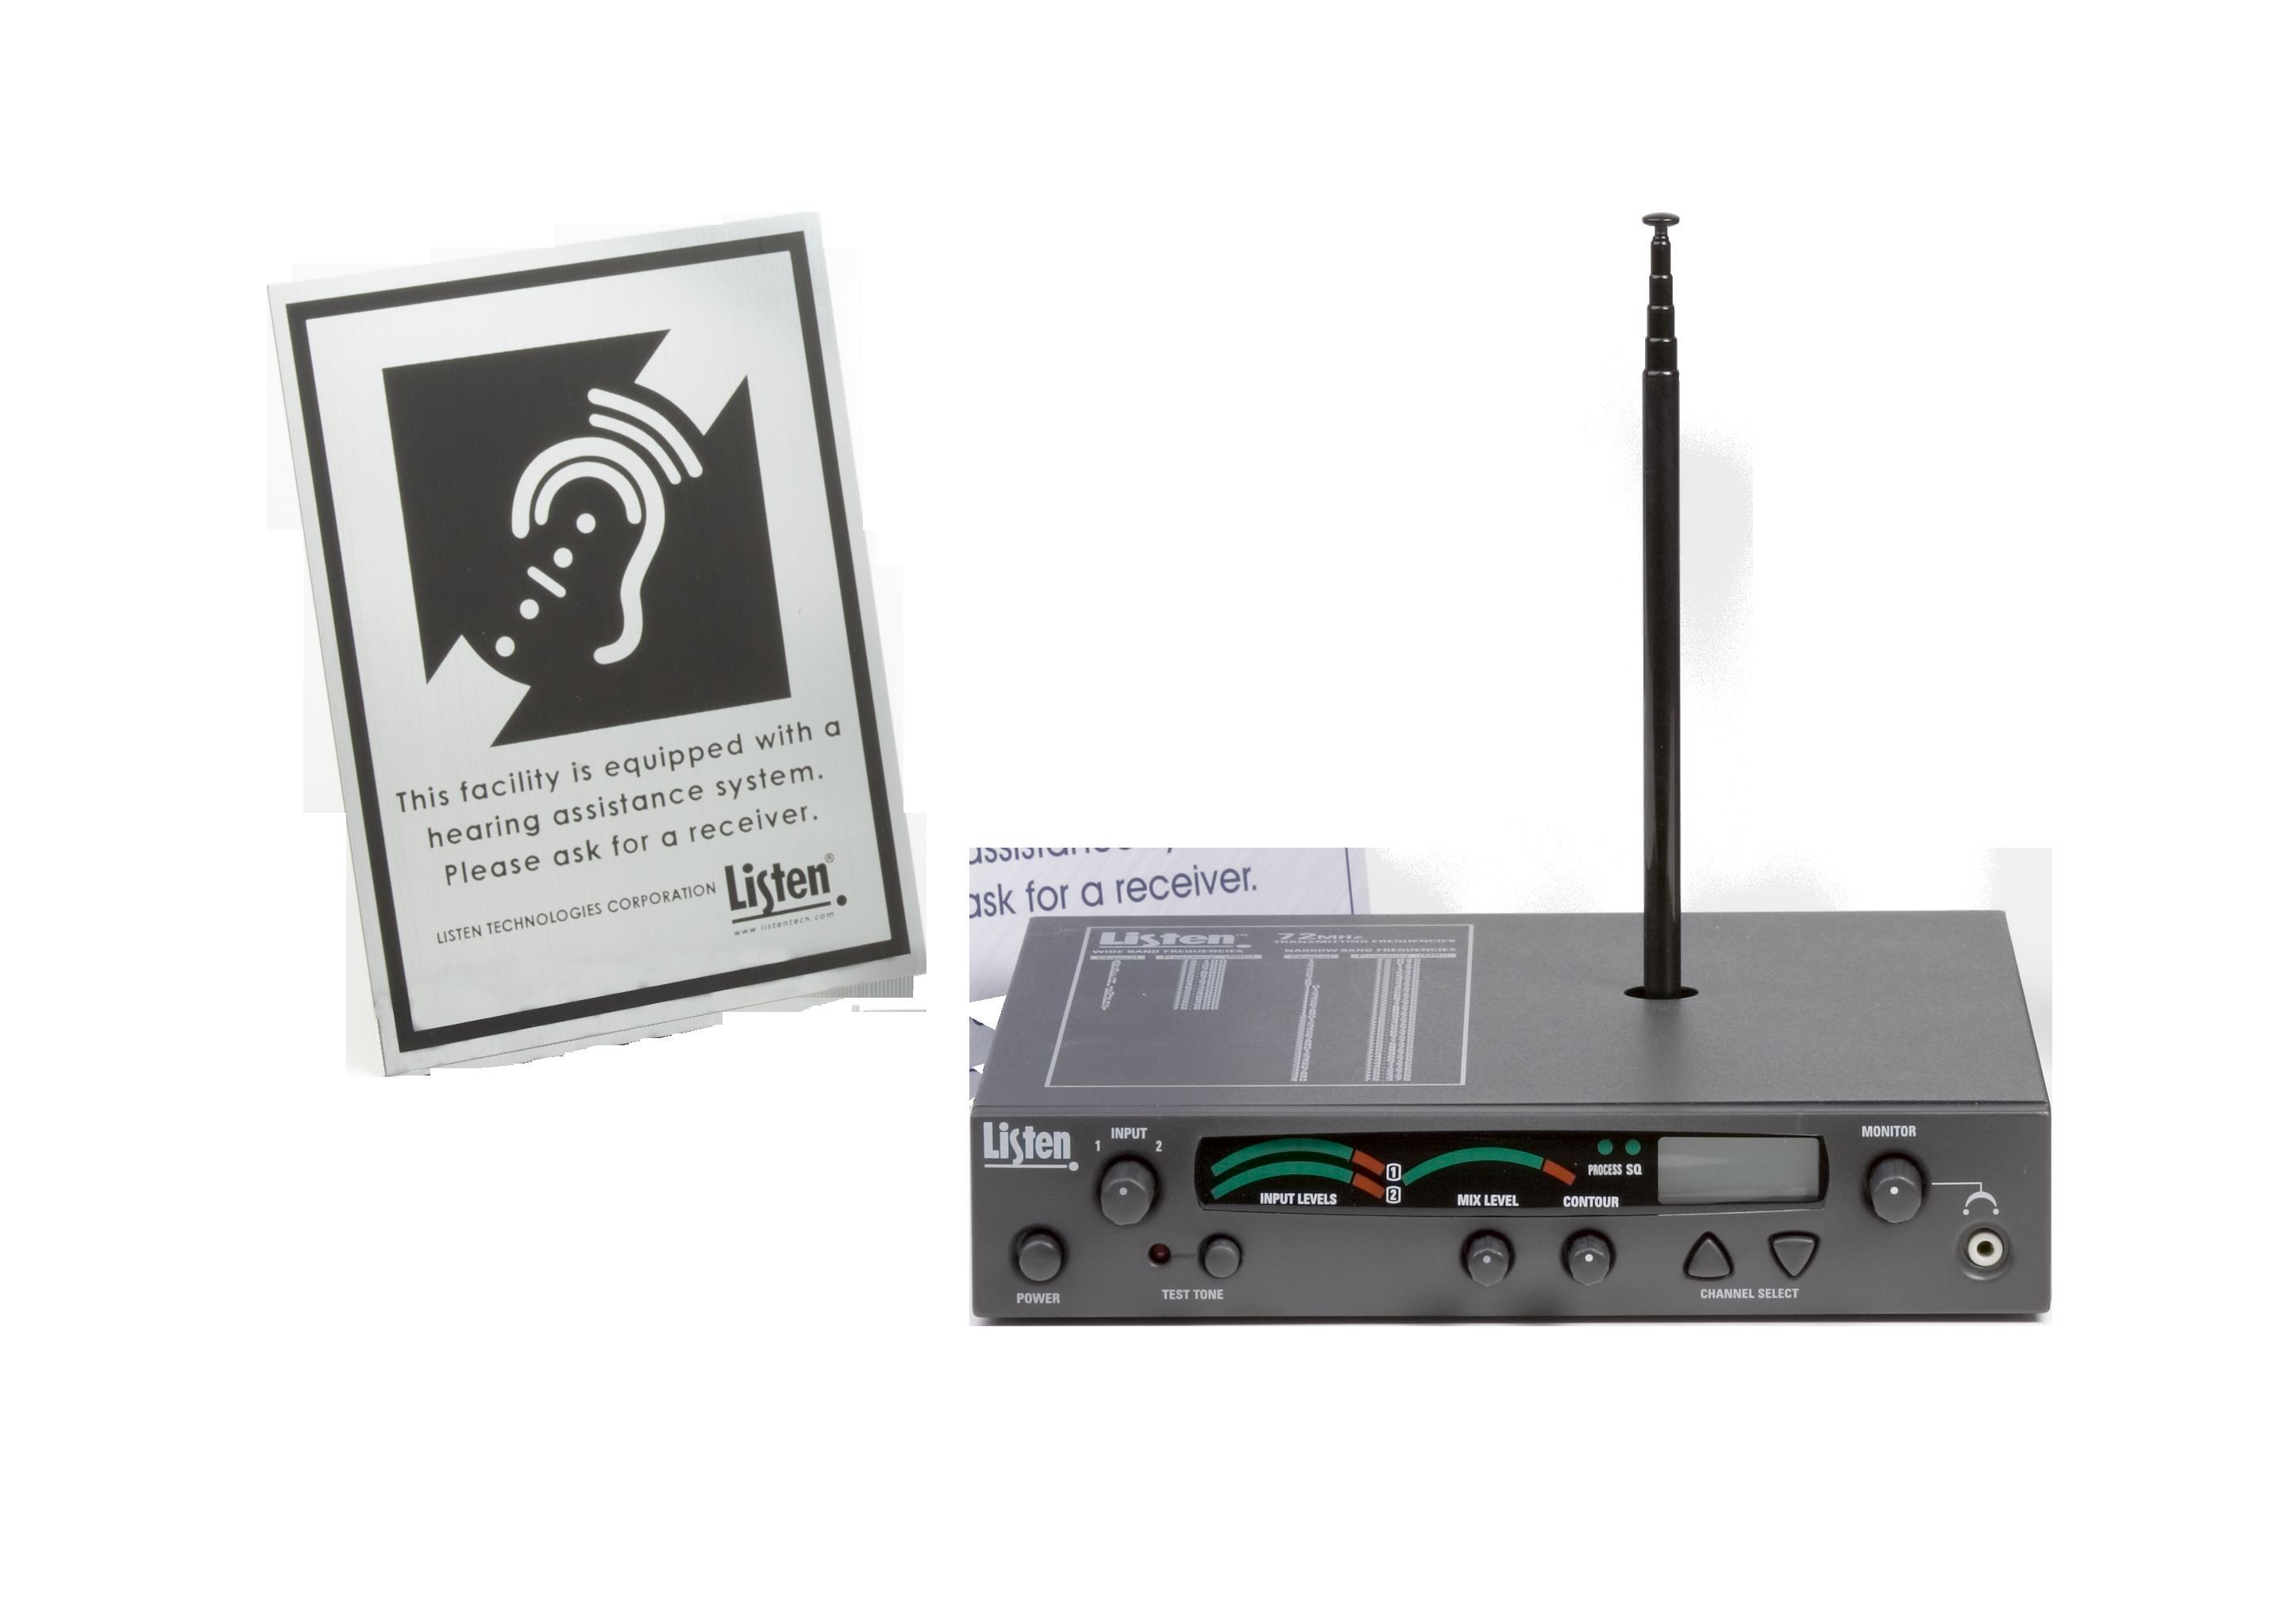 Stationary Rf Transmitter Package 1 72 Mhz Listen Technologies Mixed Signal Transceiver